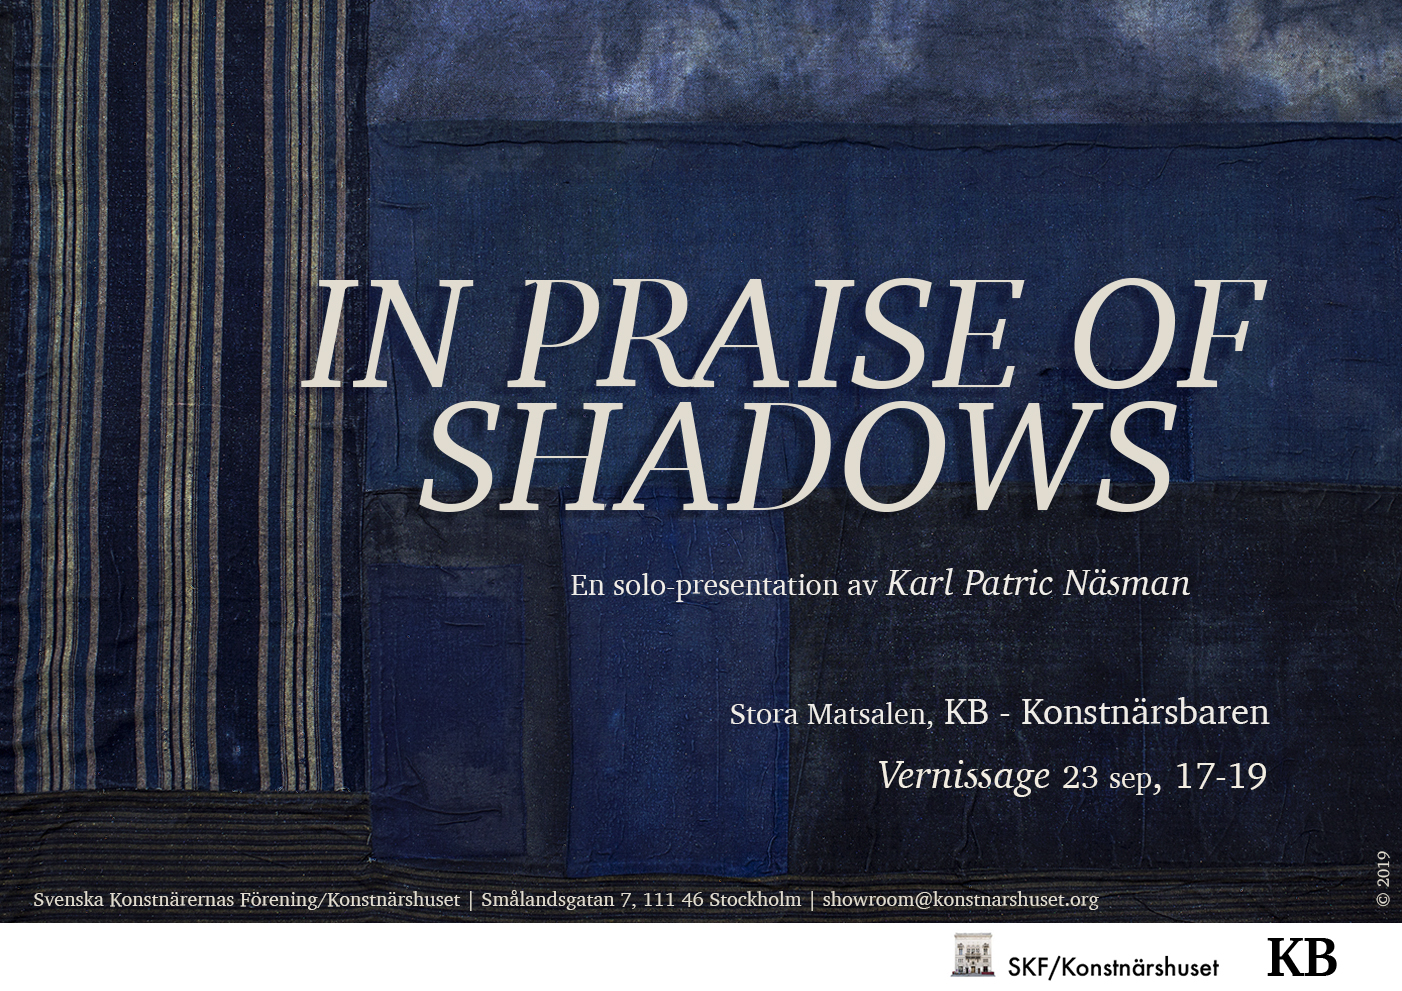 in praise of shadows poster final.jpg